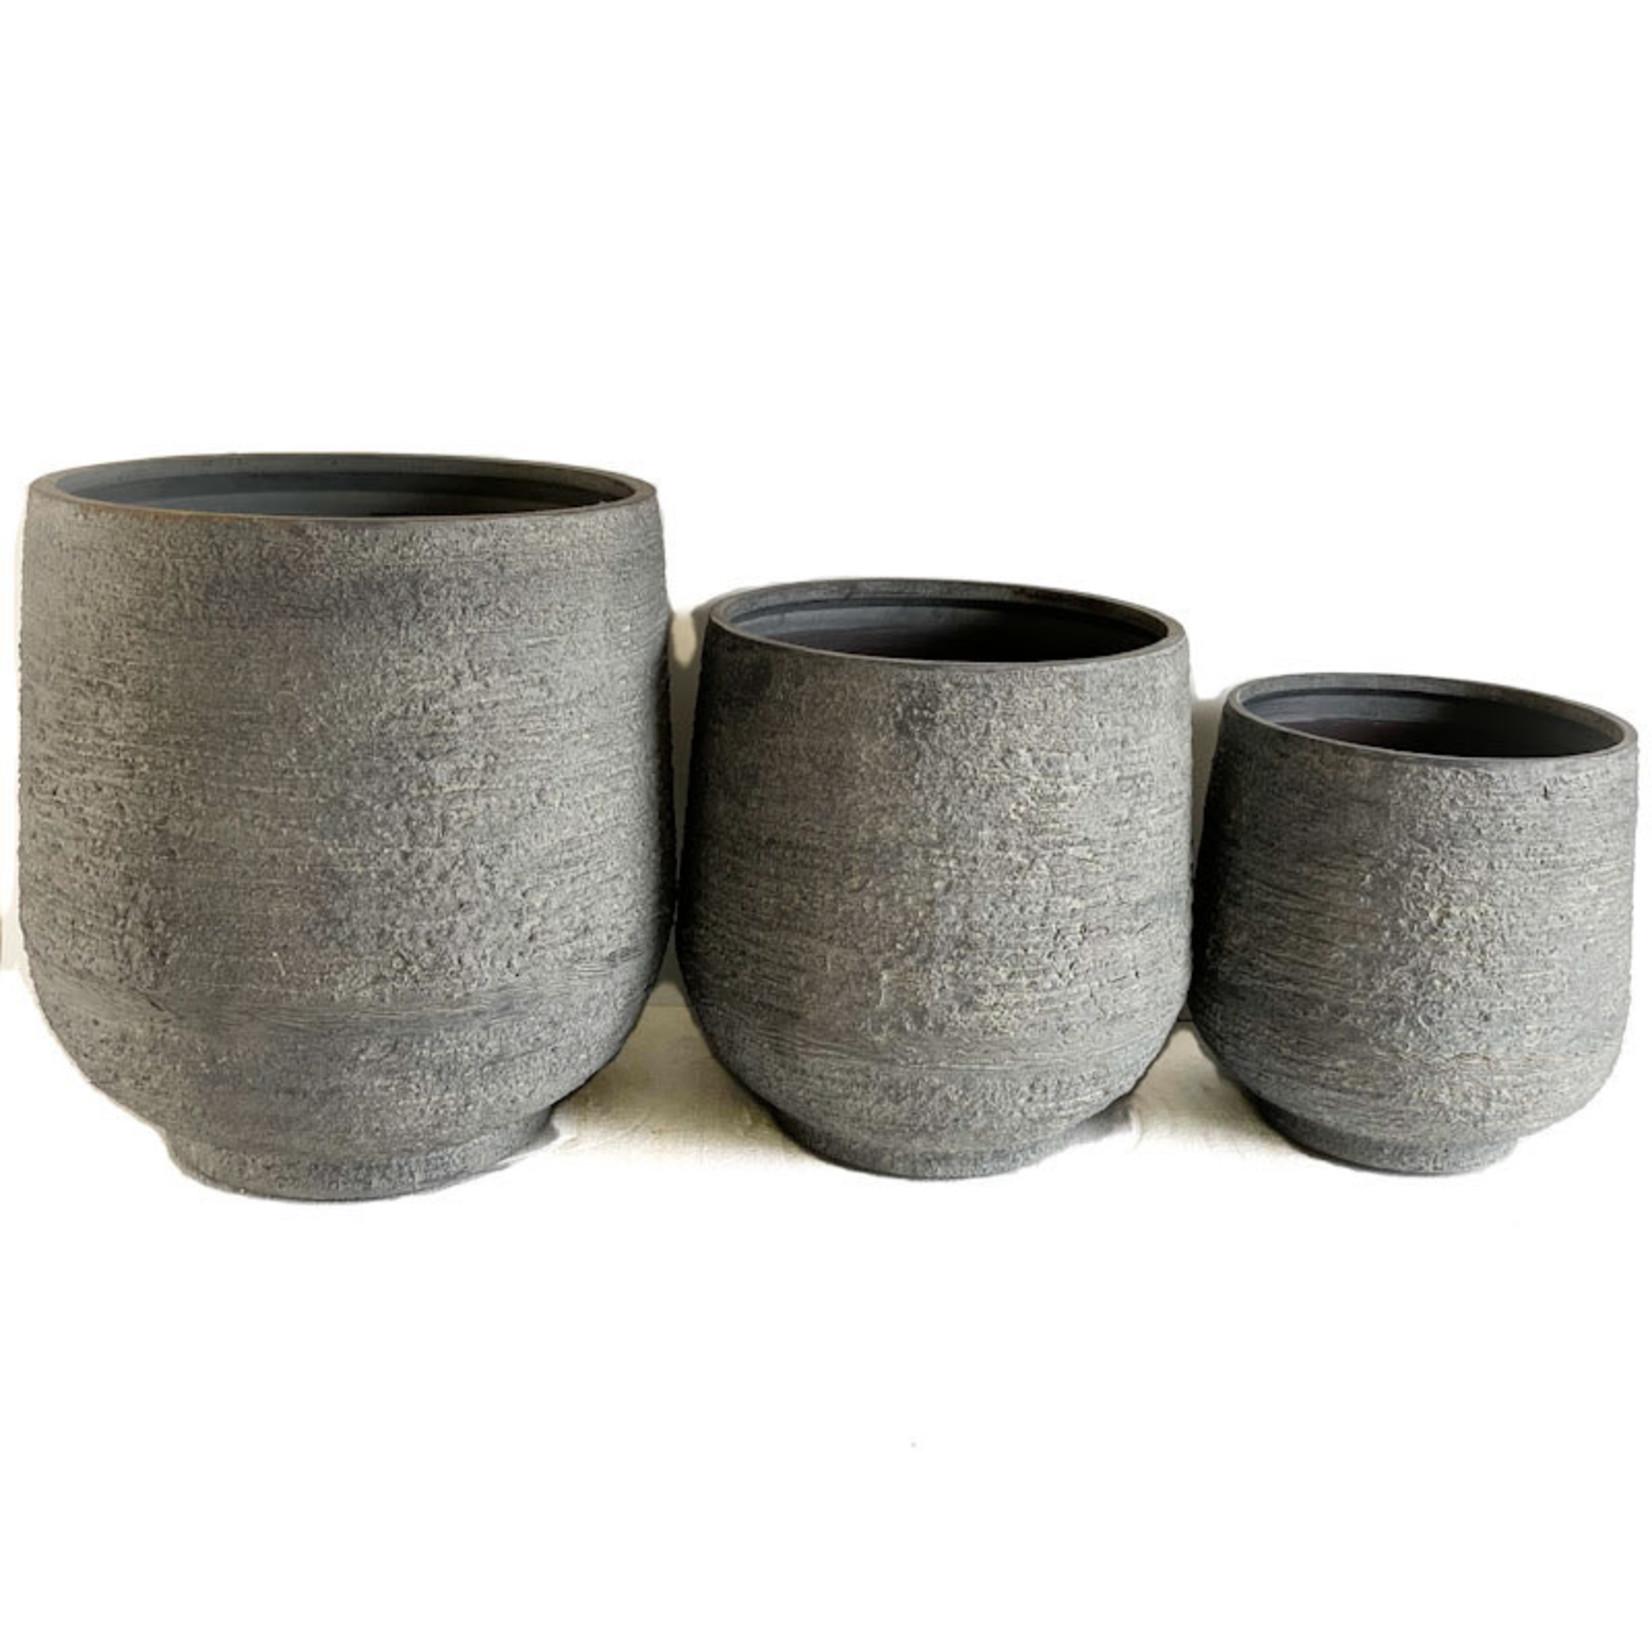 Medium Cylinder Planter - Cobblestone Grey